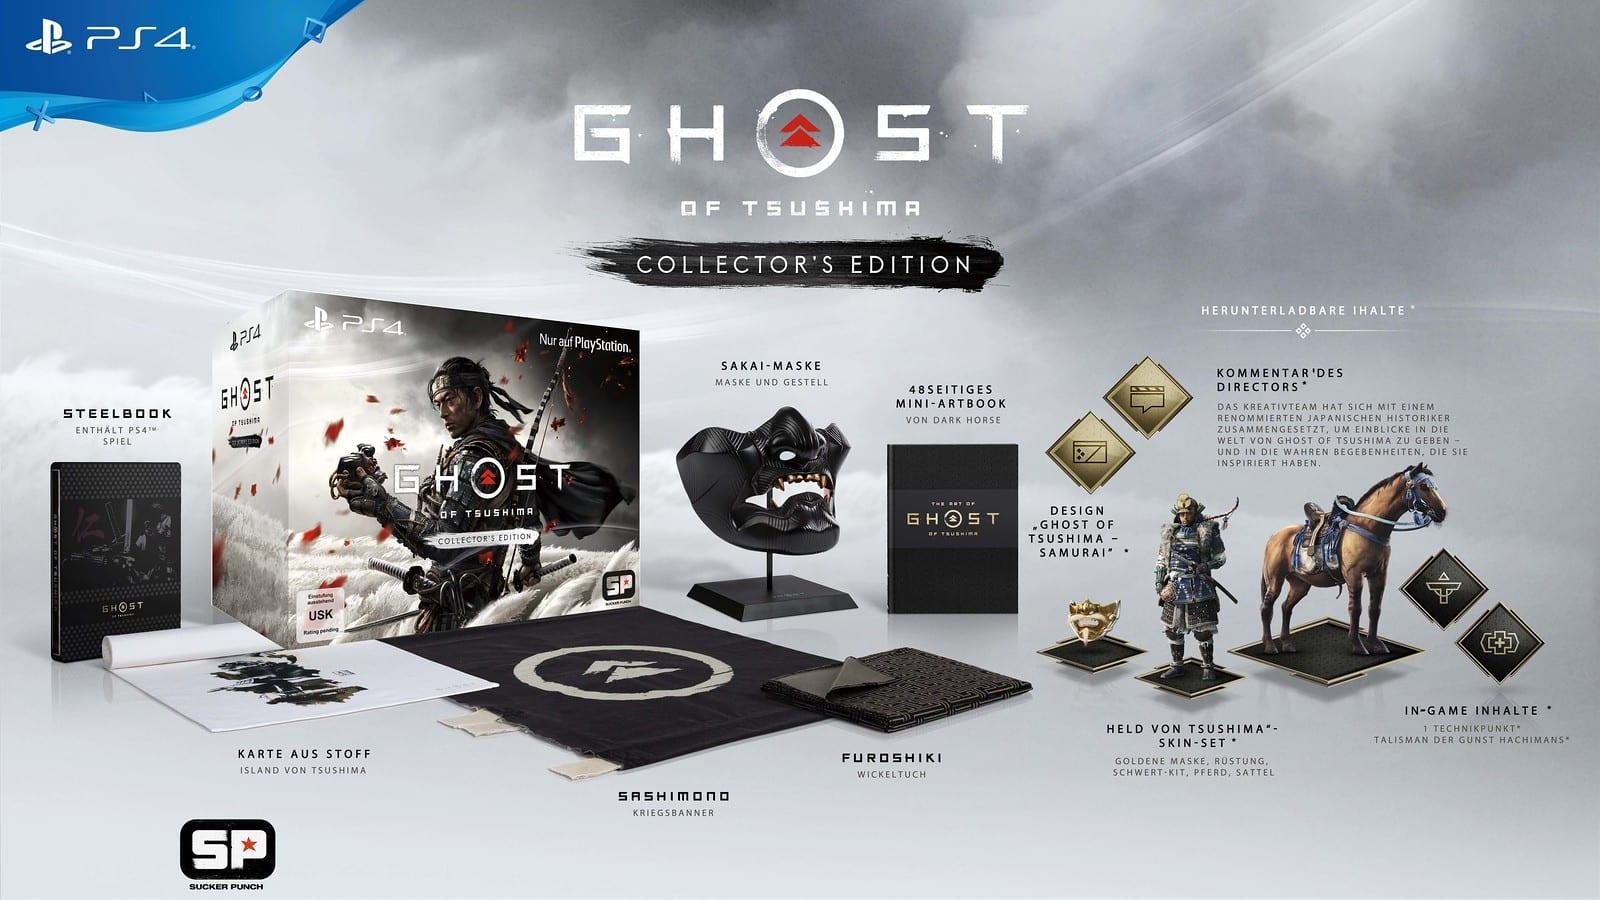 Collectors Edition von Ghost of Tsushima